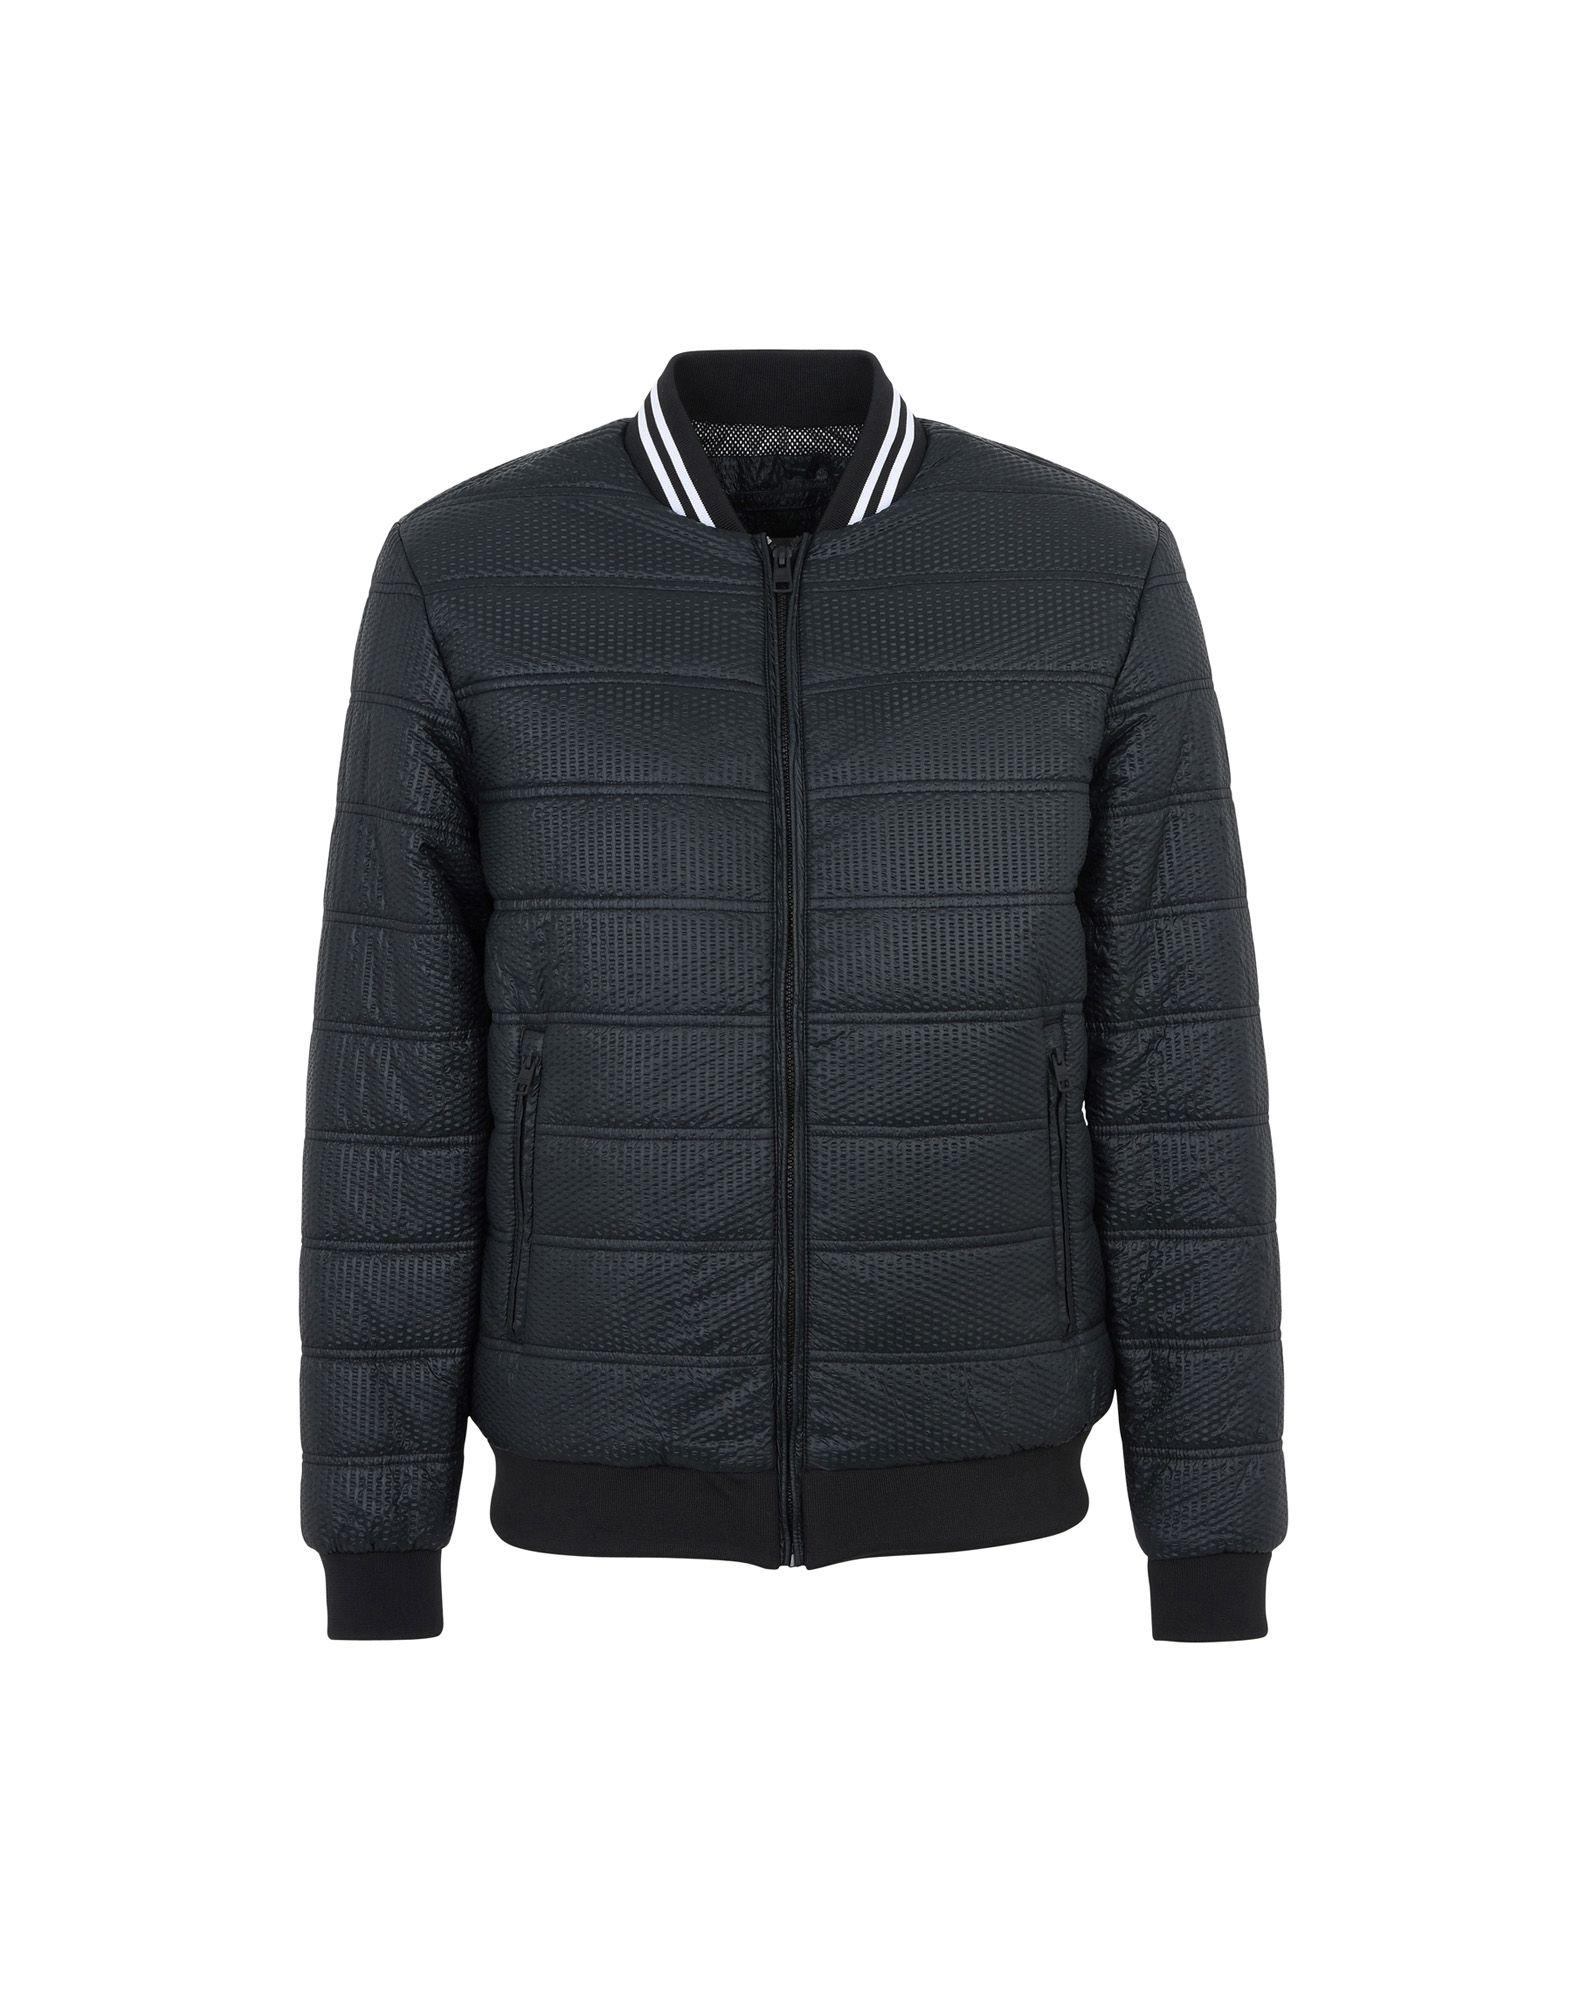 CALVIN KLEIN JEANS Куртка куртка calvin klein jeans j20j2 05385 0990